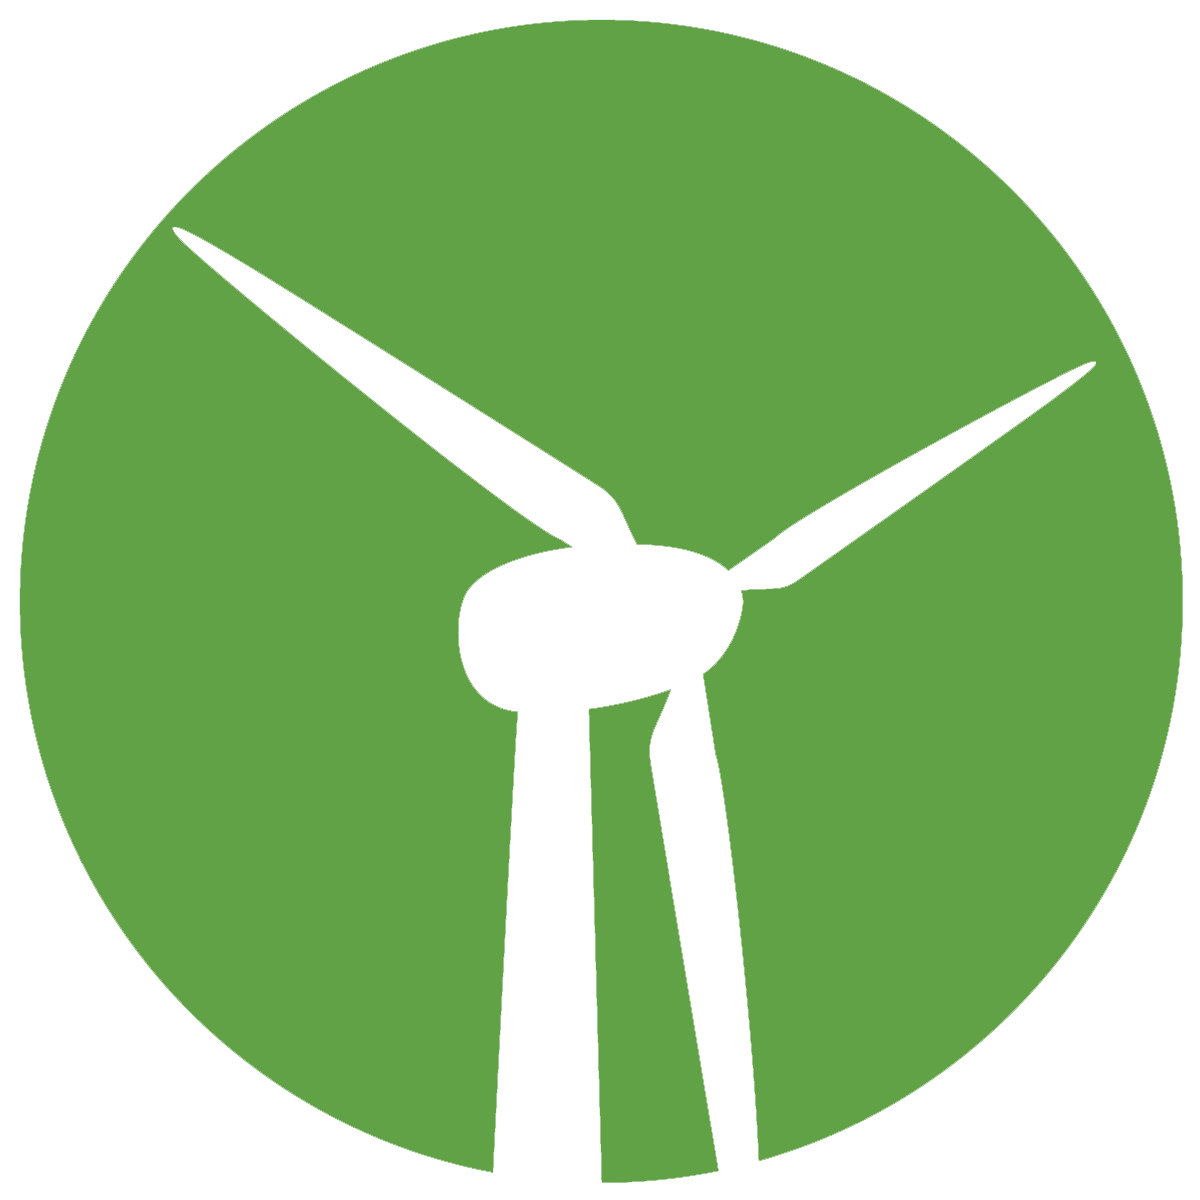 Wind turbine icon on green background